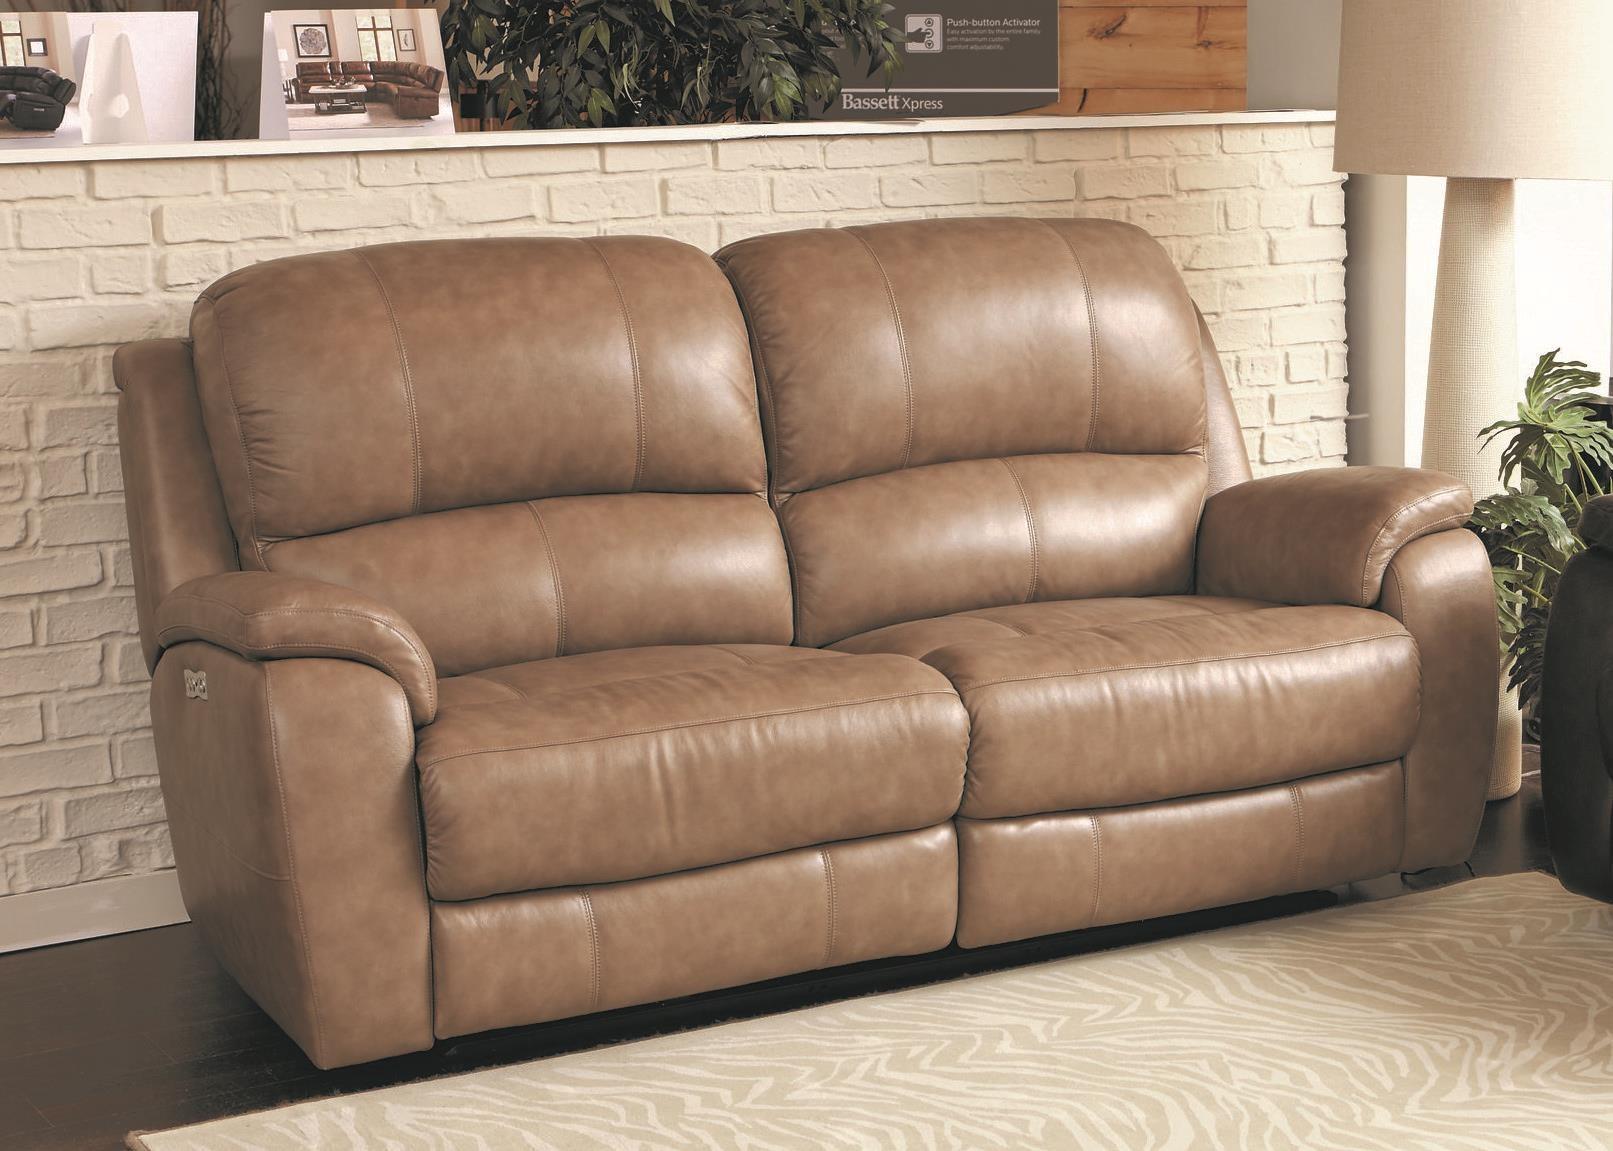 Bassett Godfrey Mushroom Leather Power Reclining Sofa - Item Number: 3700-P62M